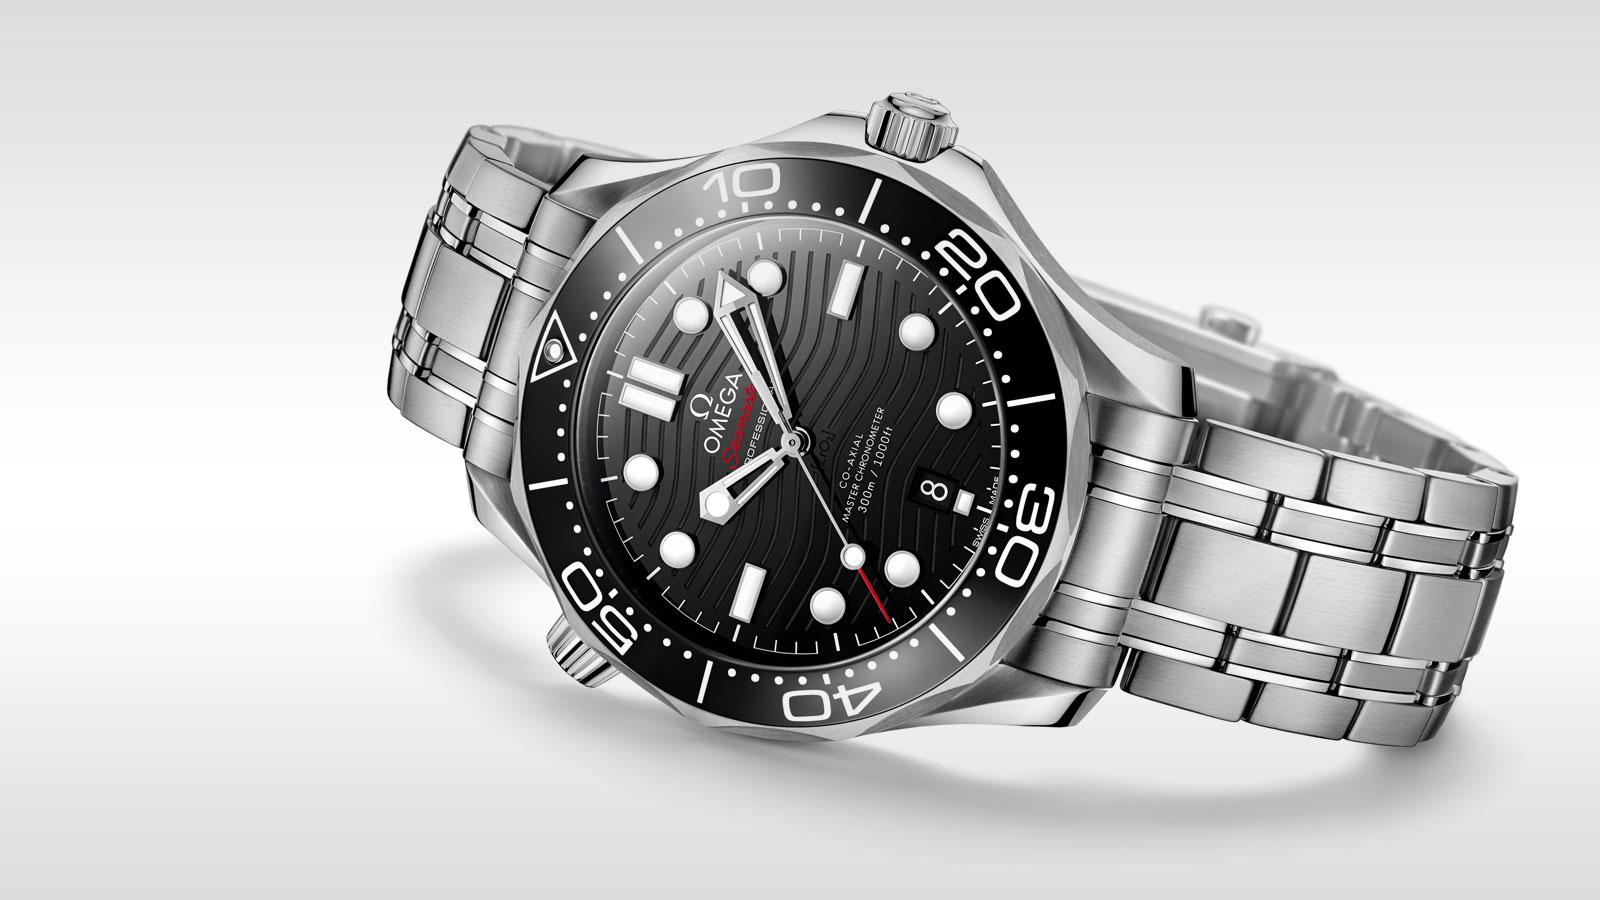 Seamaster 300米潜水表 300米潜水表 欧米茄同轴•至臻天文台表42毫米 - 210.30.42.20.01.001 - 查看 3